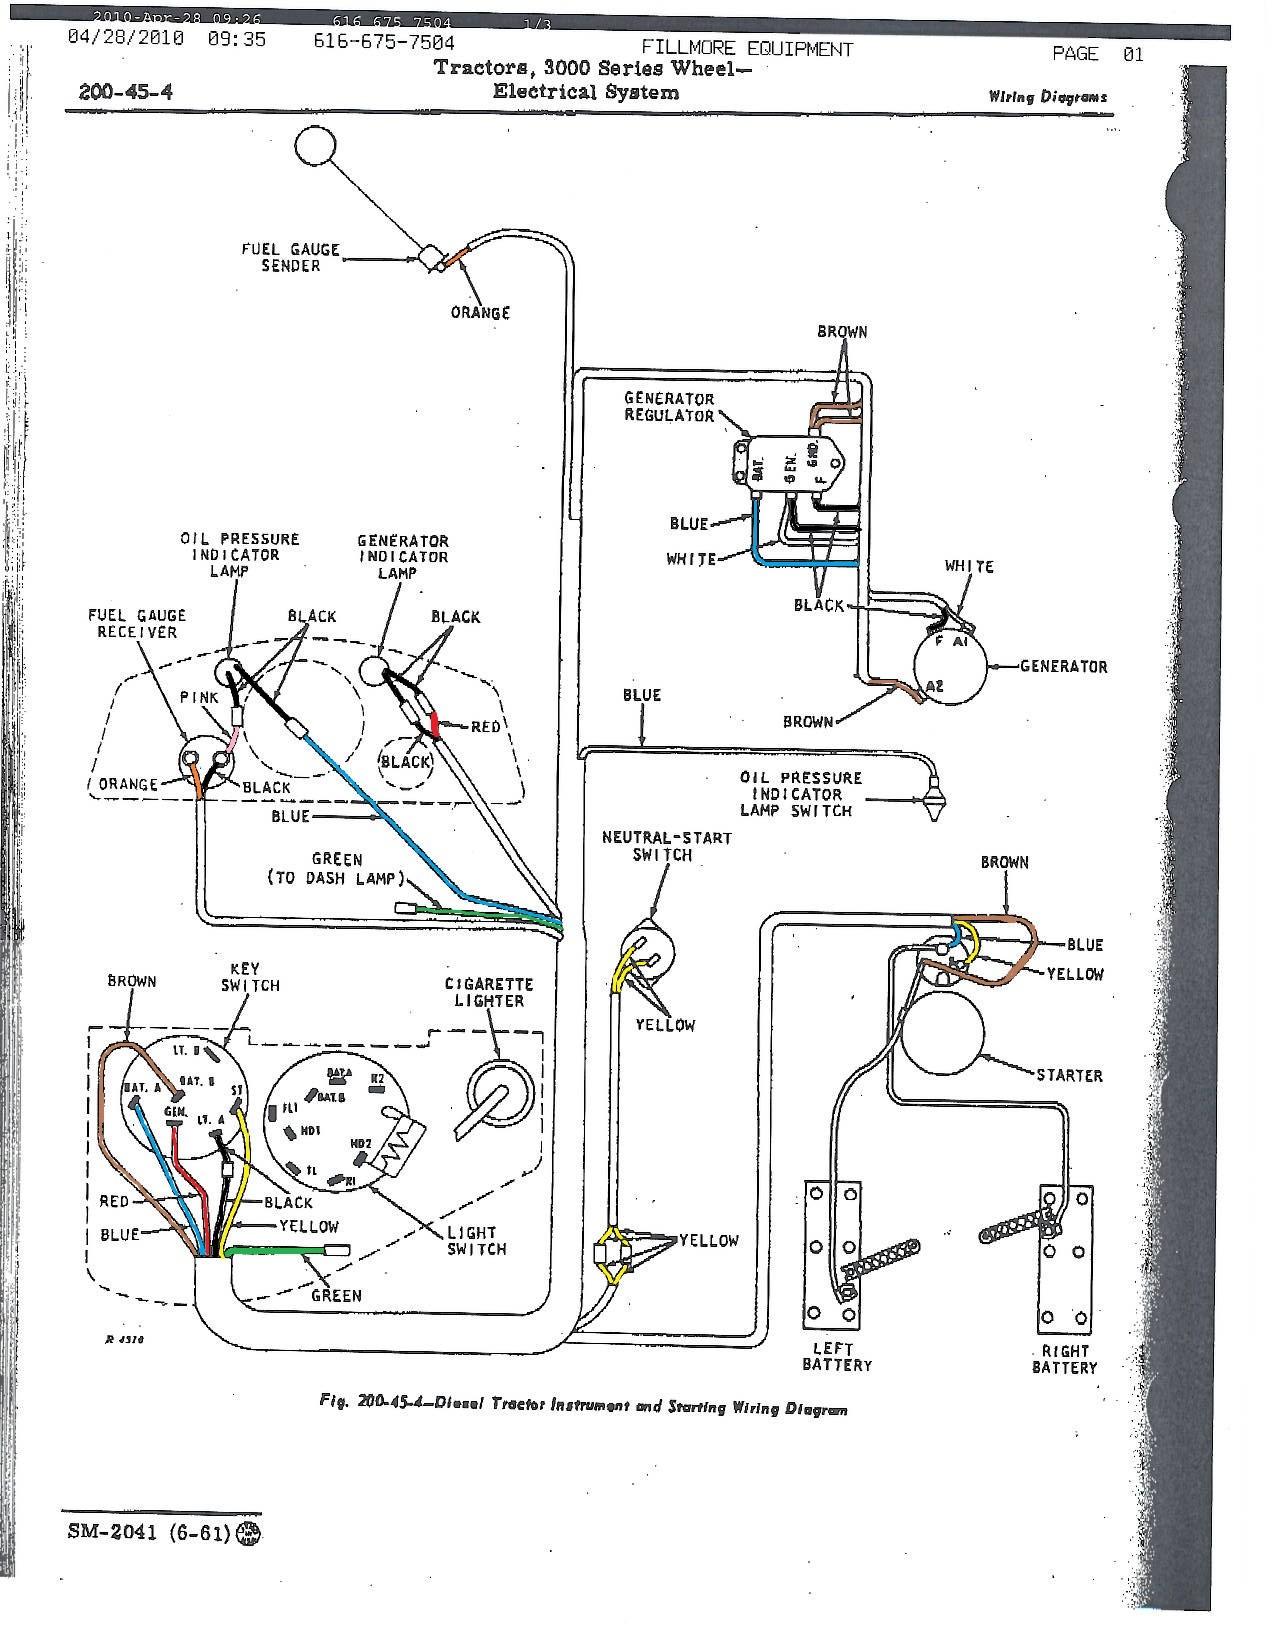 4020 Jd Wiring Diagram Vg 8304] 89 Kawasaki 650sx Wiring Diagram Free Diagram Of 4020 Jd Wiring Diagram